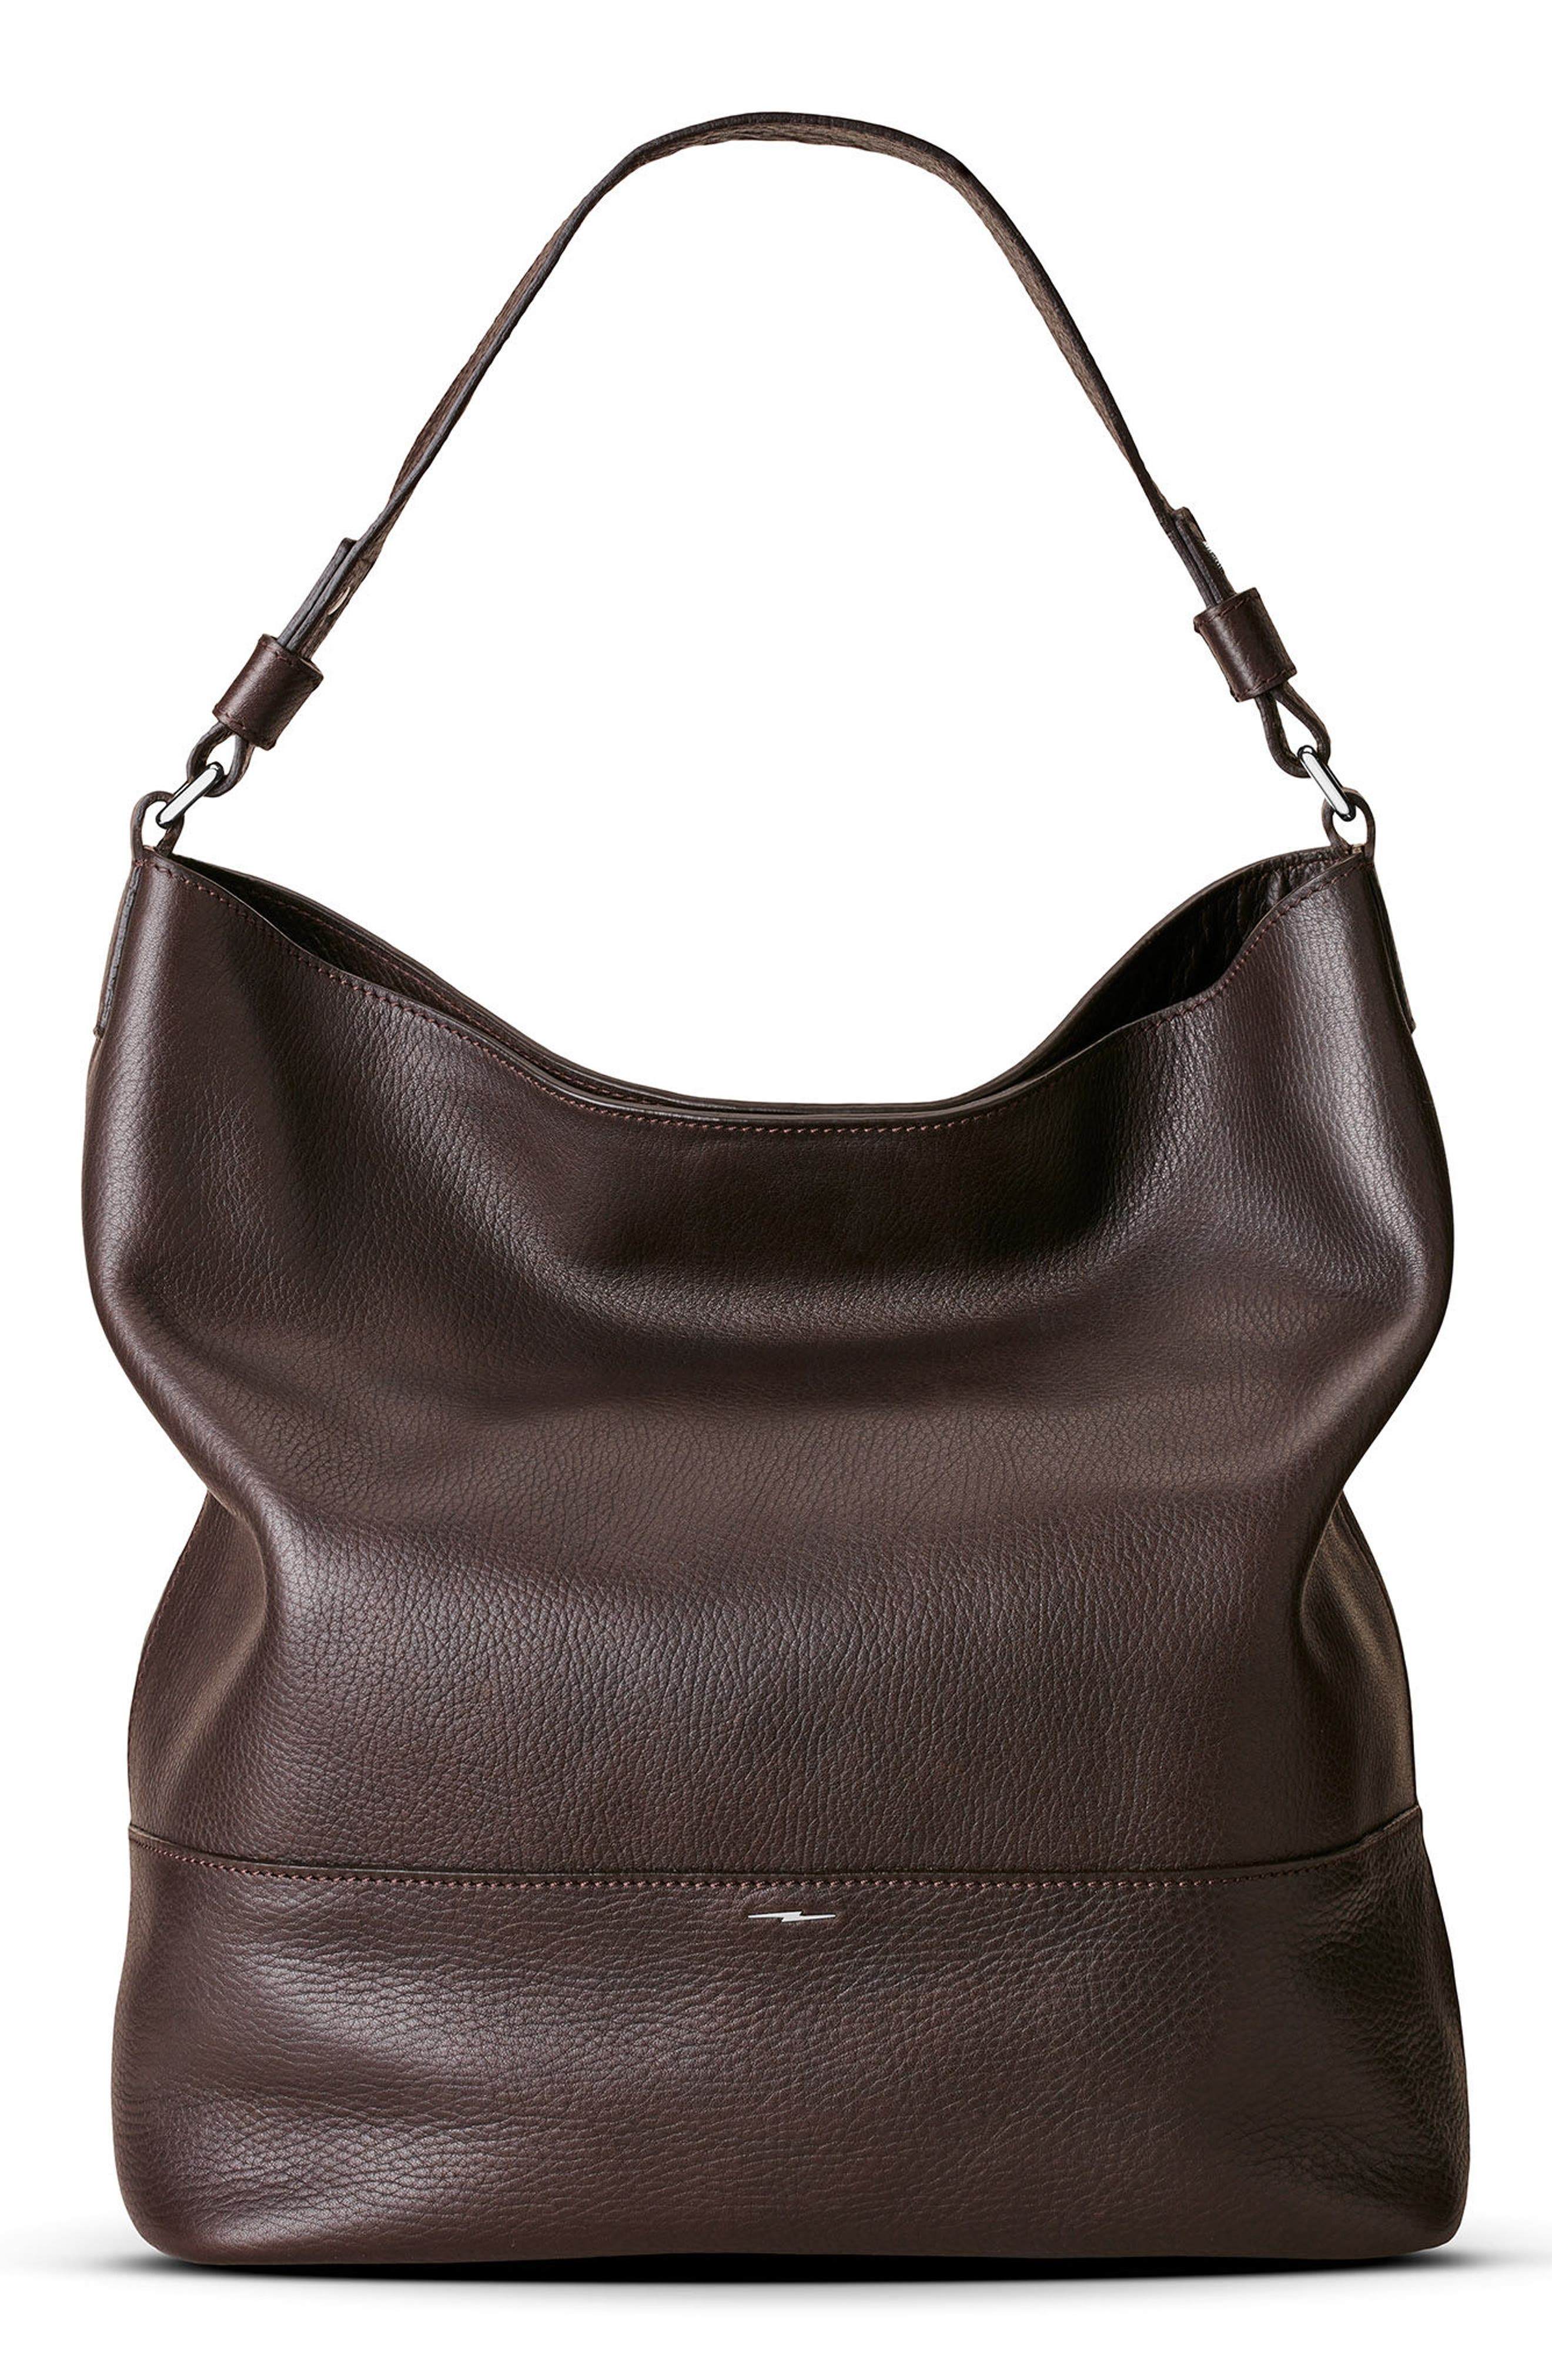 SHINOLA,                             Relaxed Calfskin Leather Hobo Bag,                             Alternate thumbnail 9, color,                             240